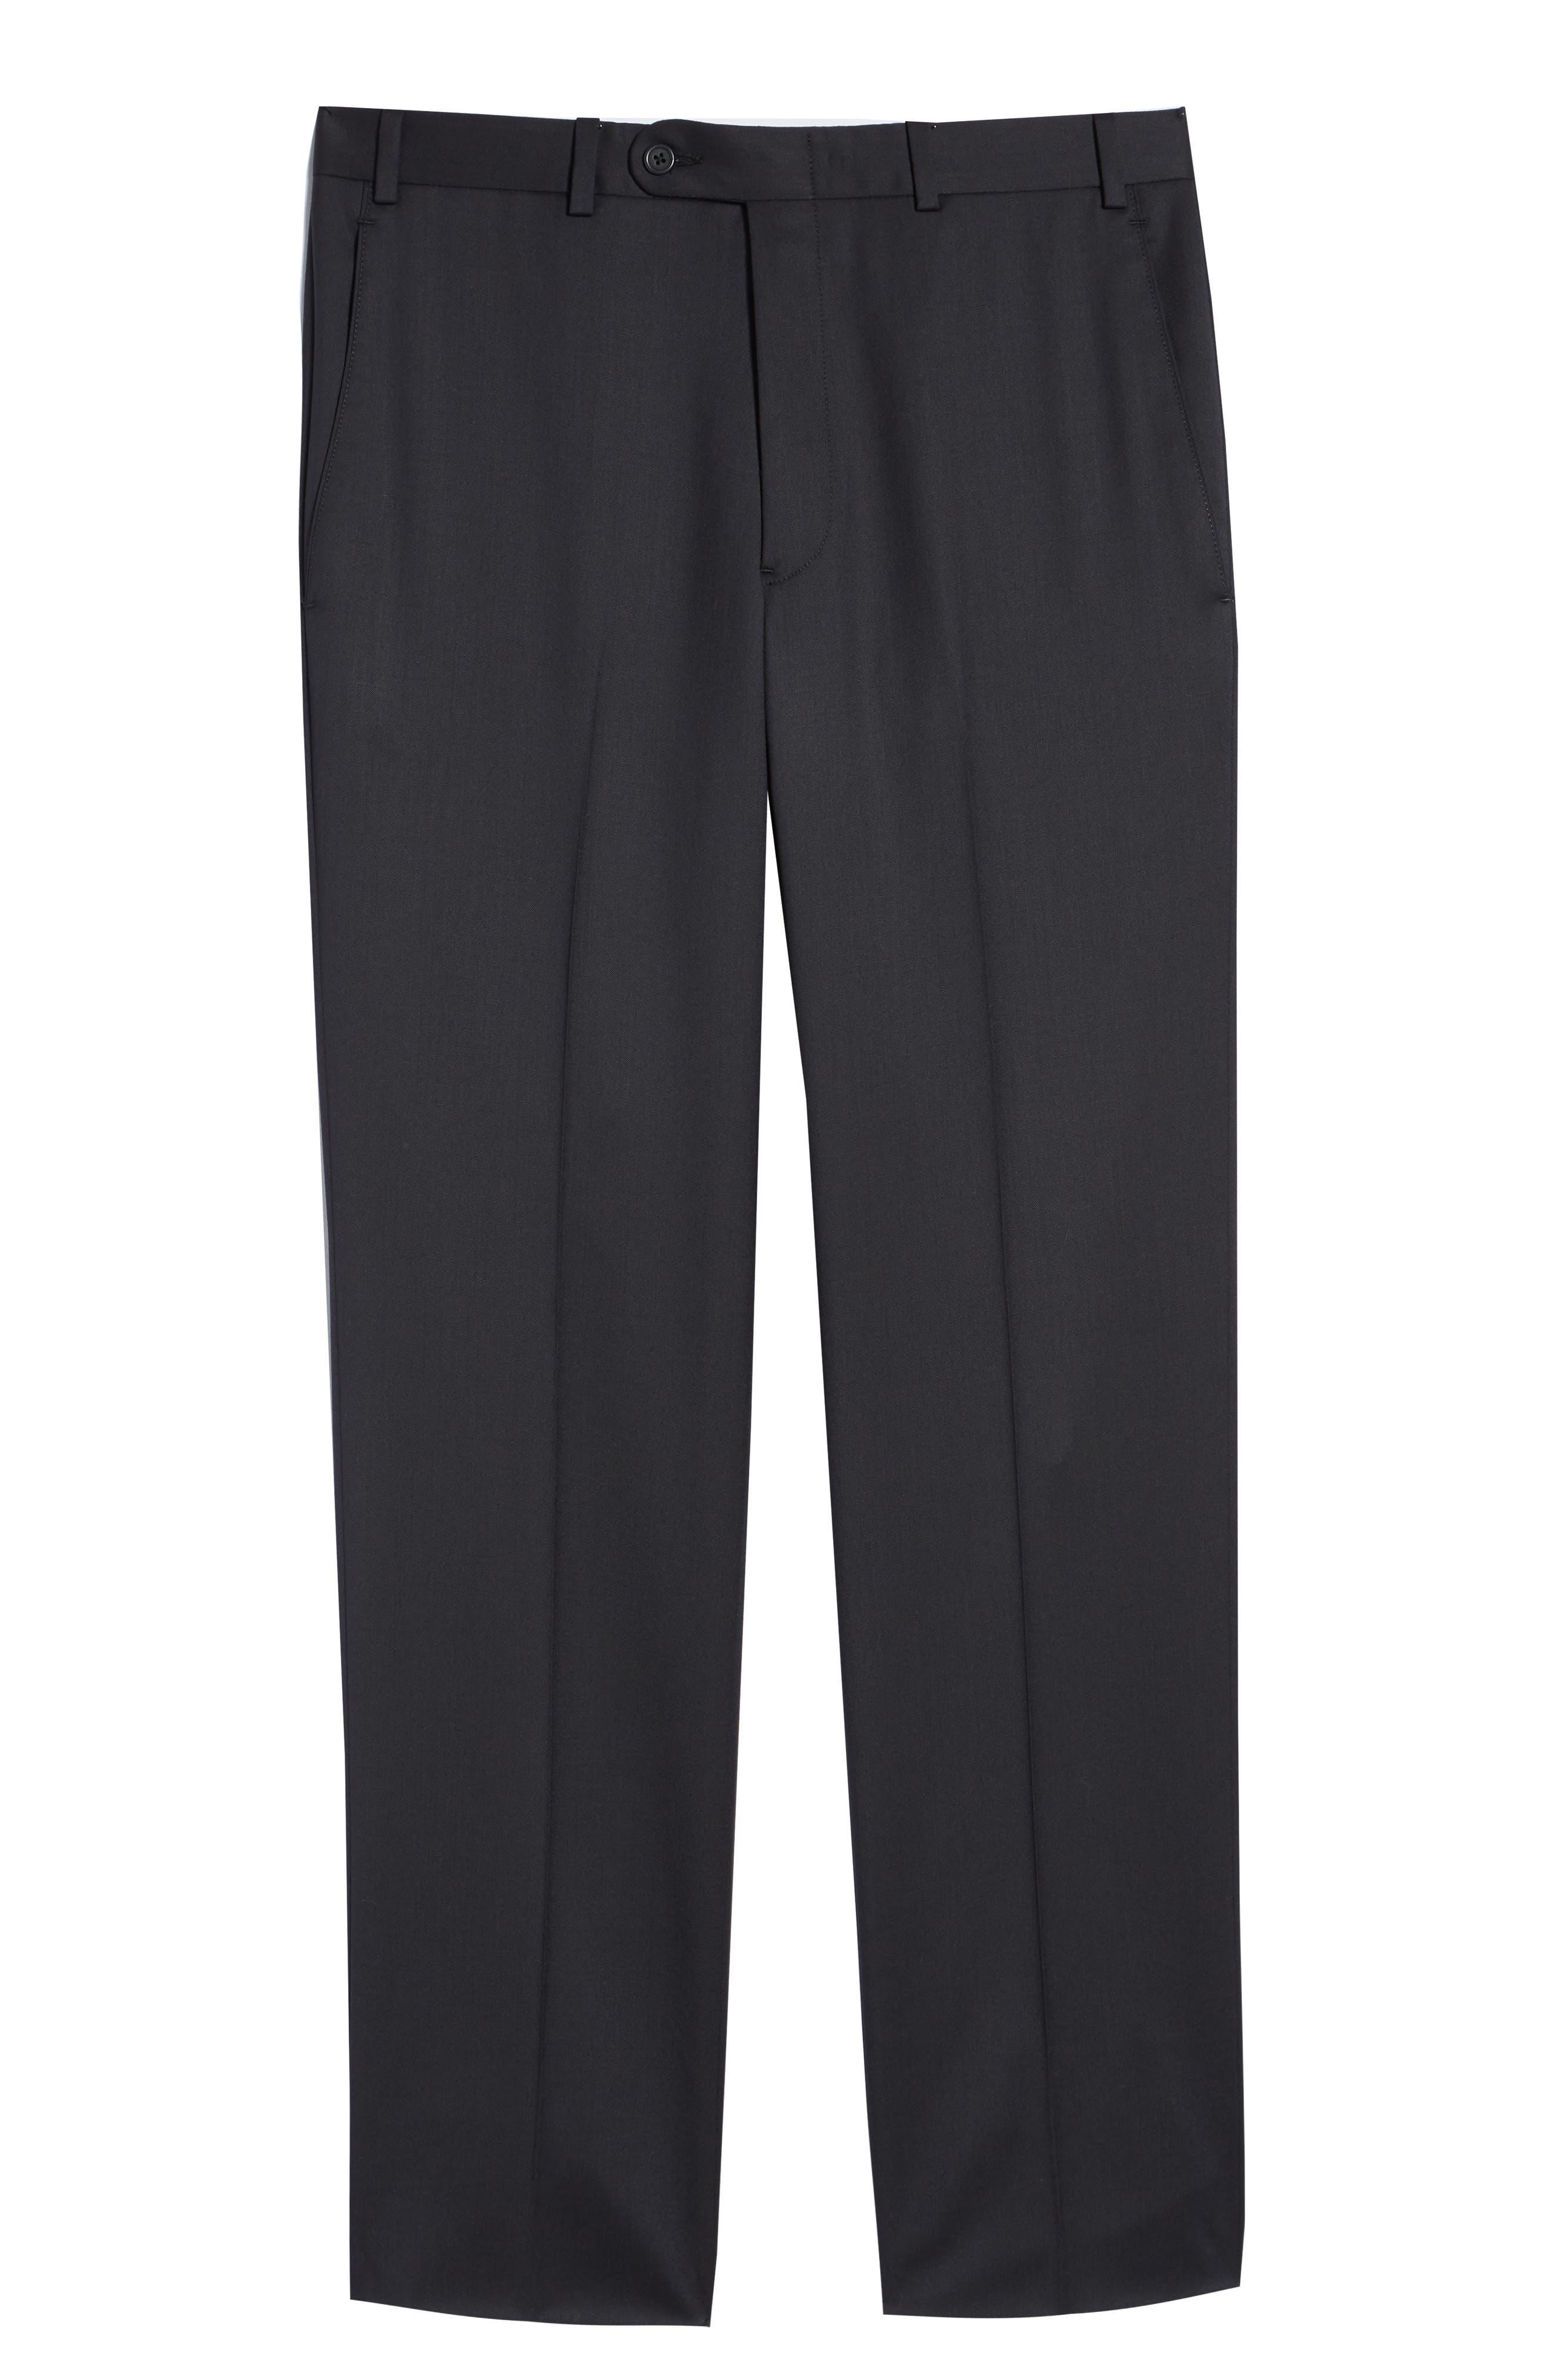 Torino Flat Front Wool Gabardine Trousers,                             Alternate thumbnail 35, color,